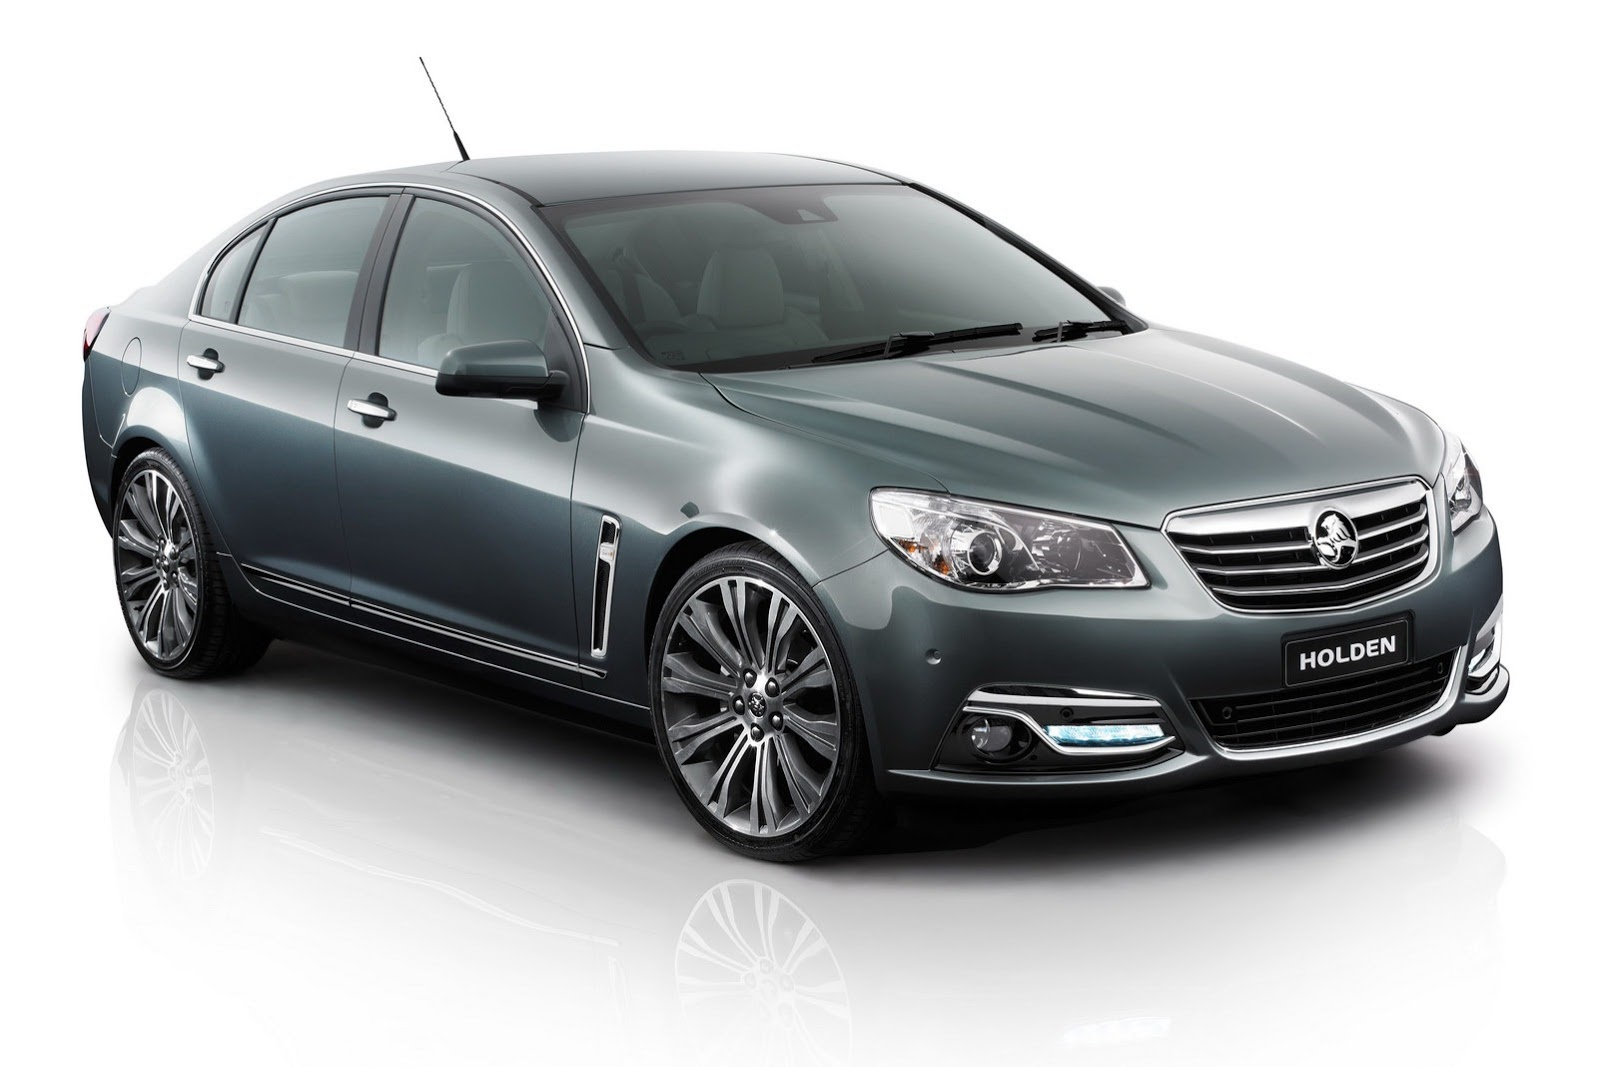 Holden reveals 2014 vf commodore aka the chevy ss autoevolution